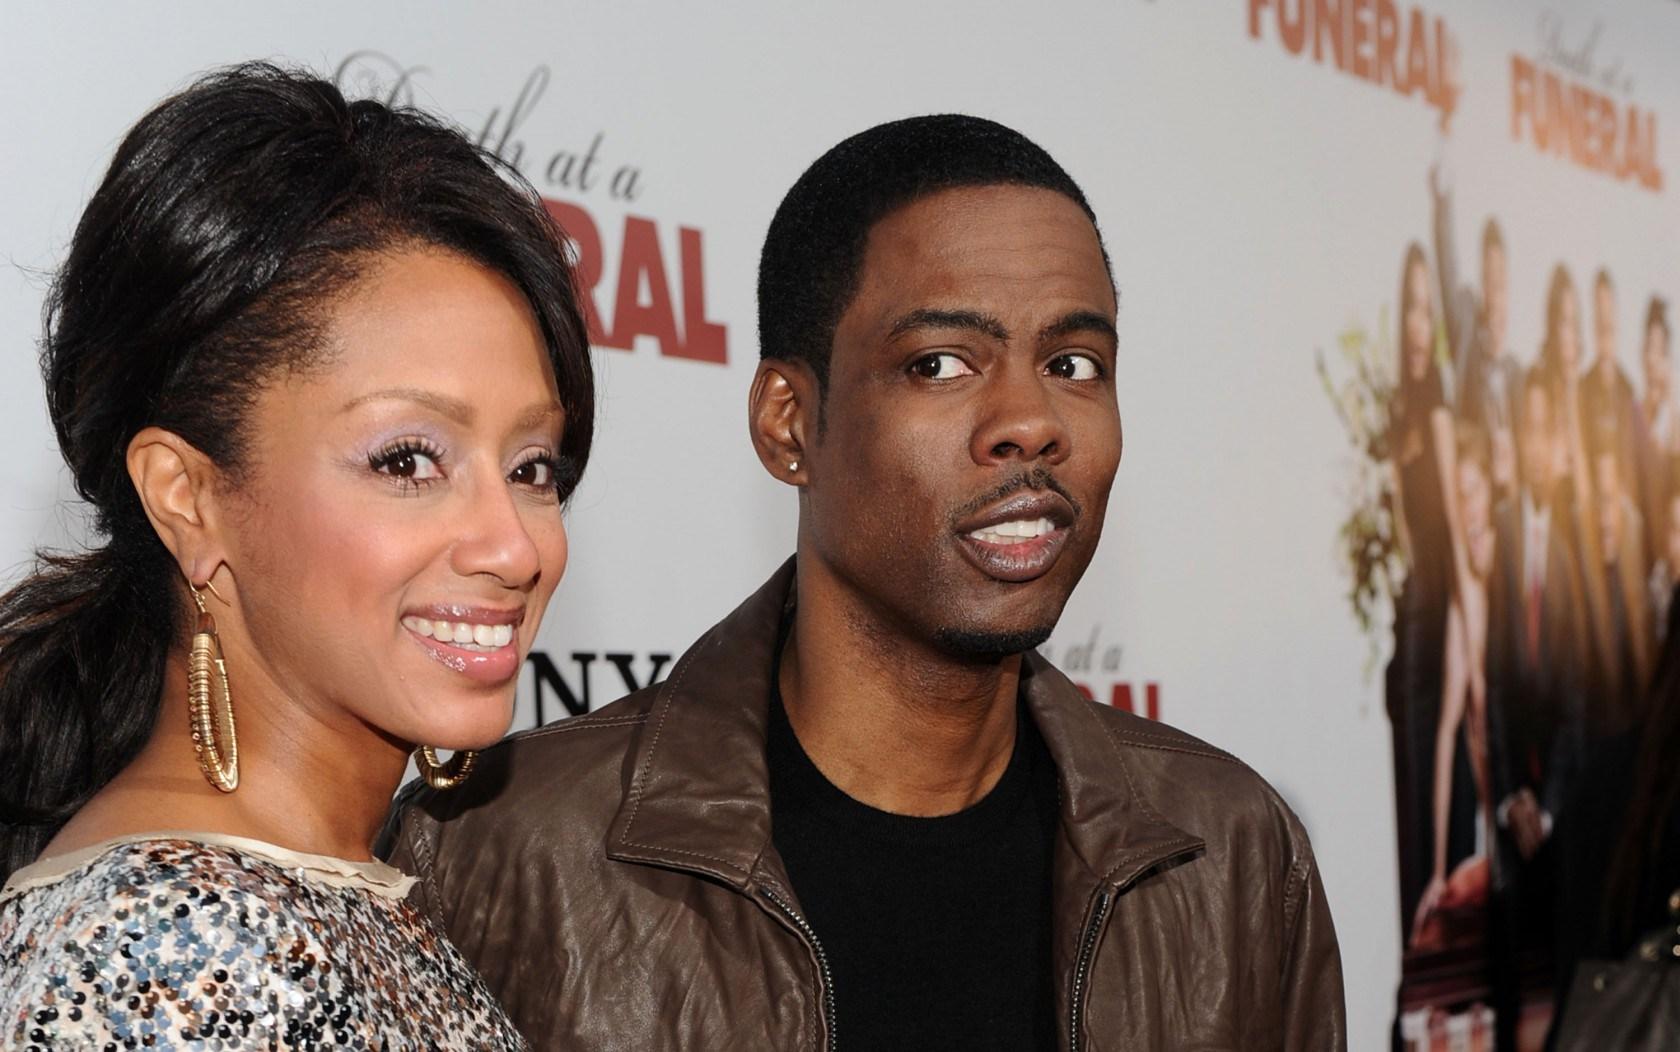 Chris Rock's Wife Seeking Massive Divorce Settlement